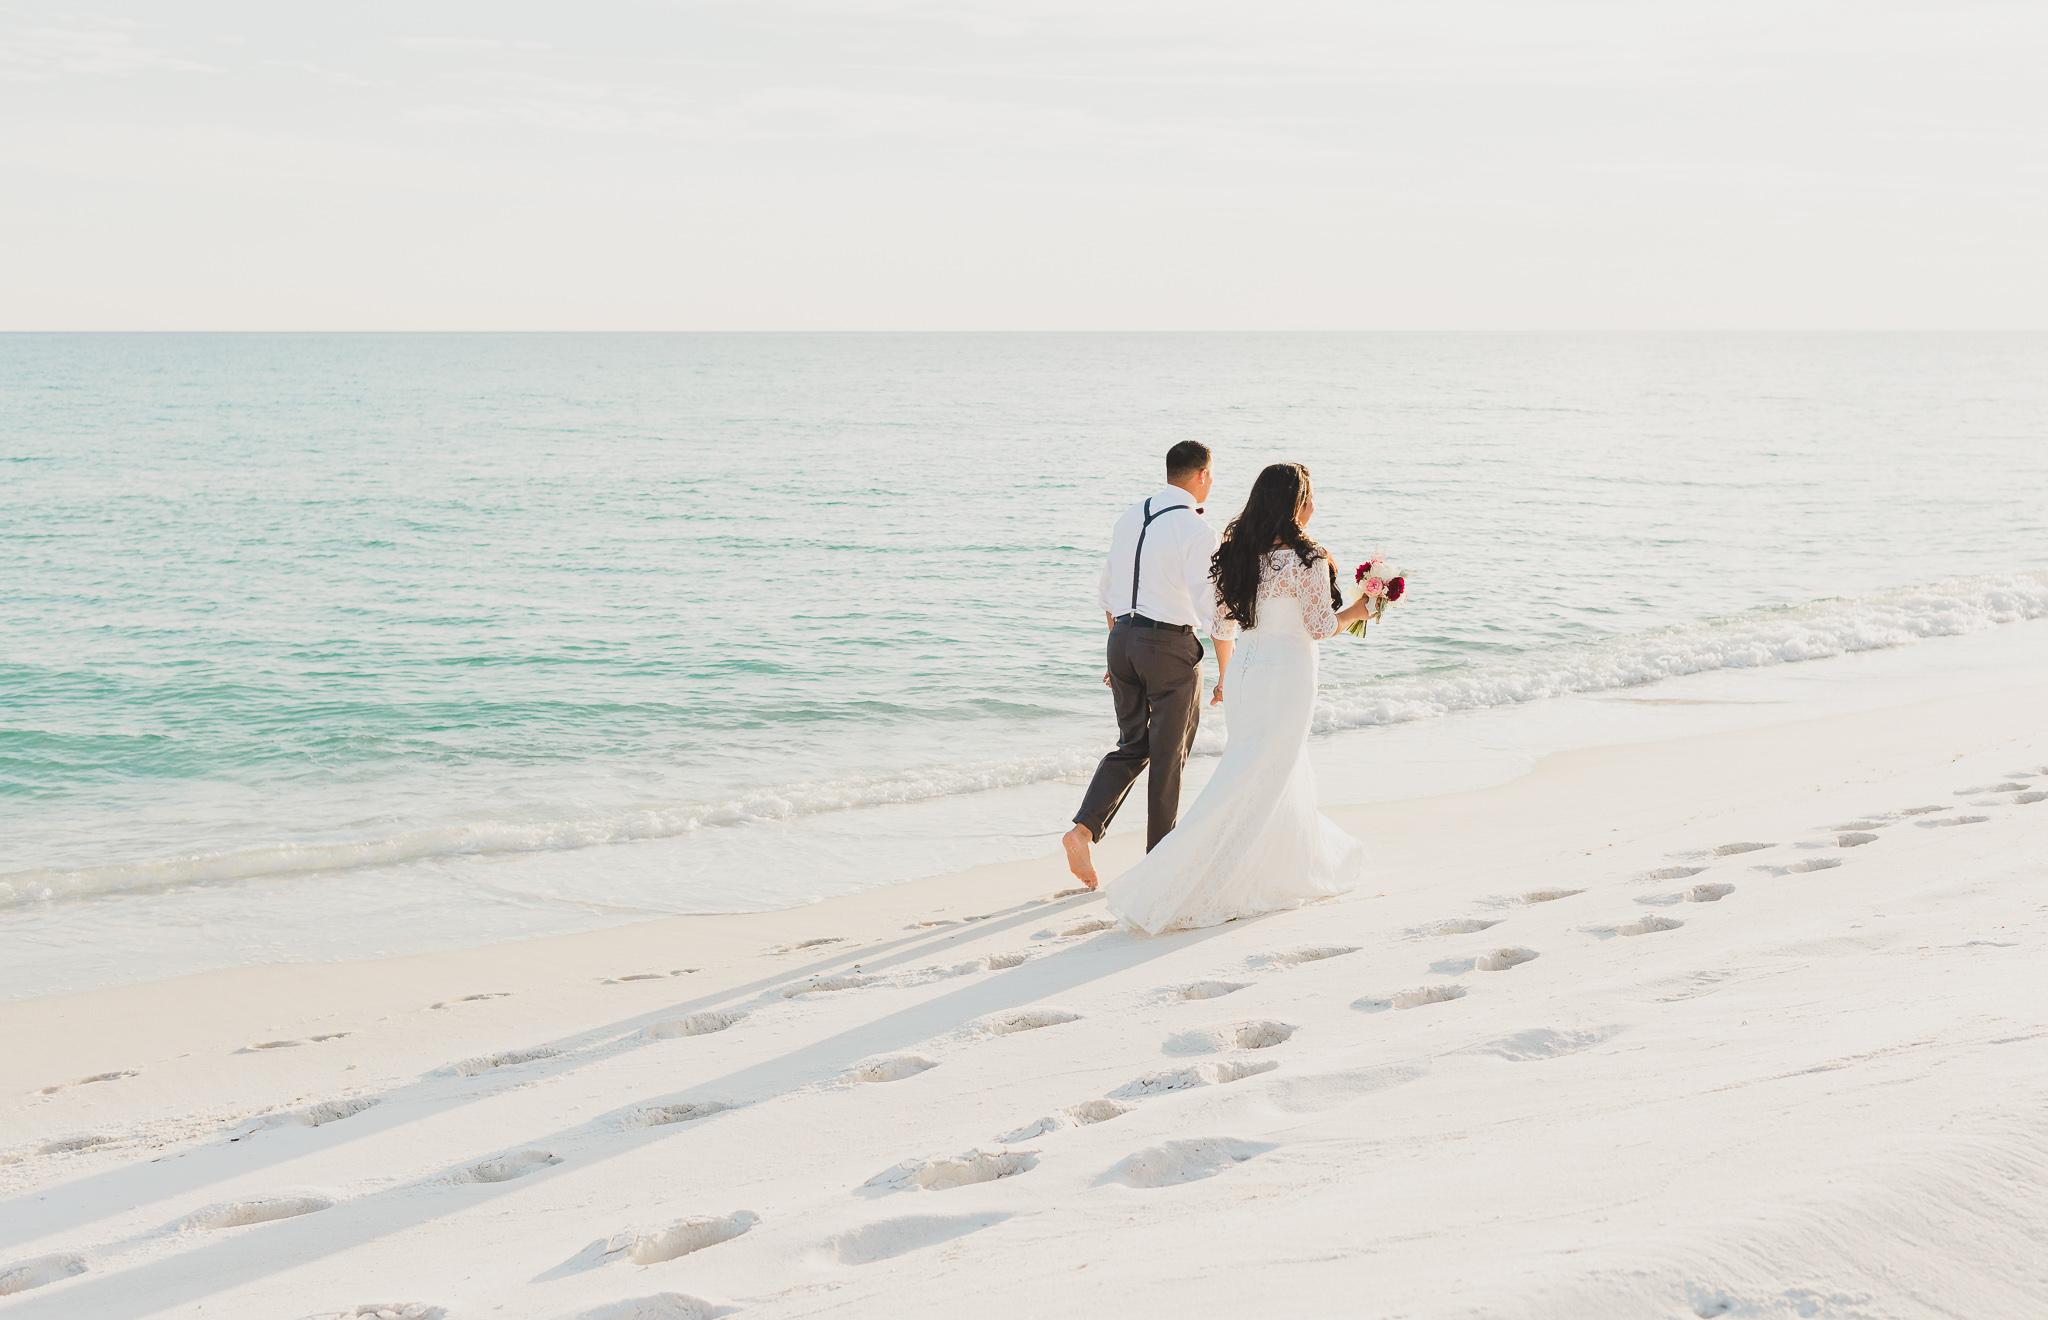 opal beach wedding bride and groom walking pose